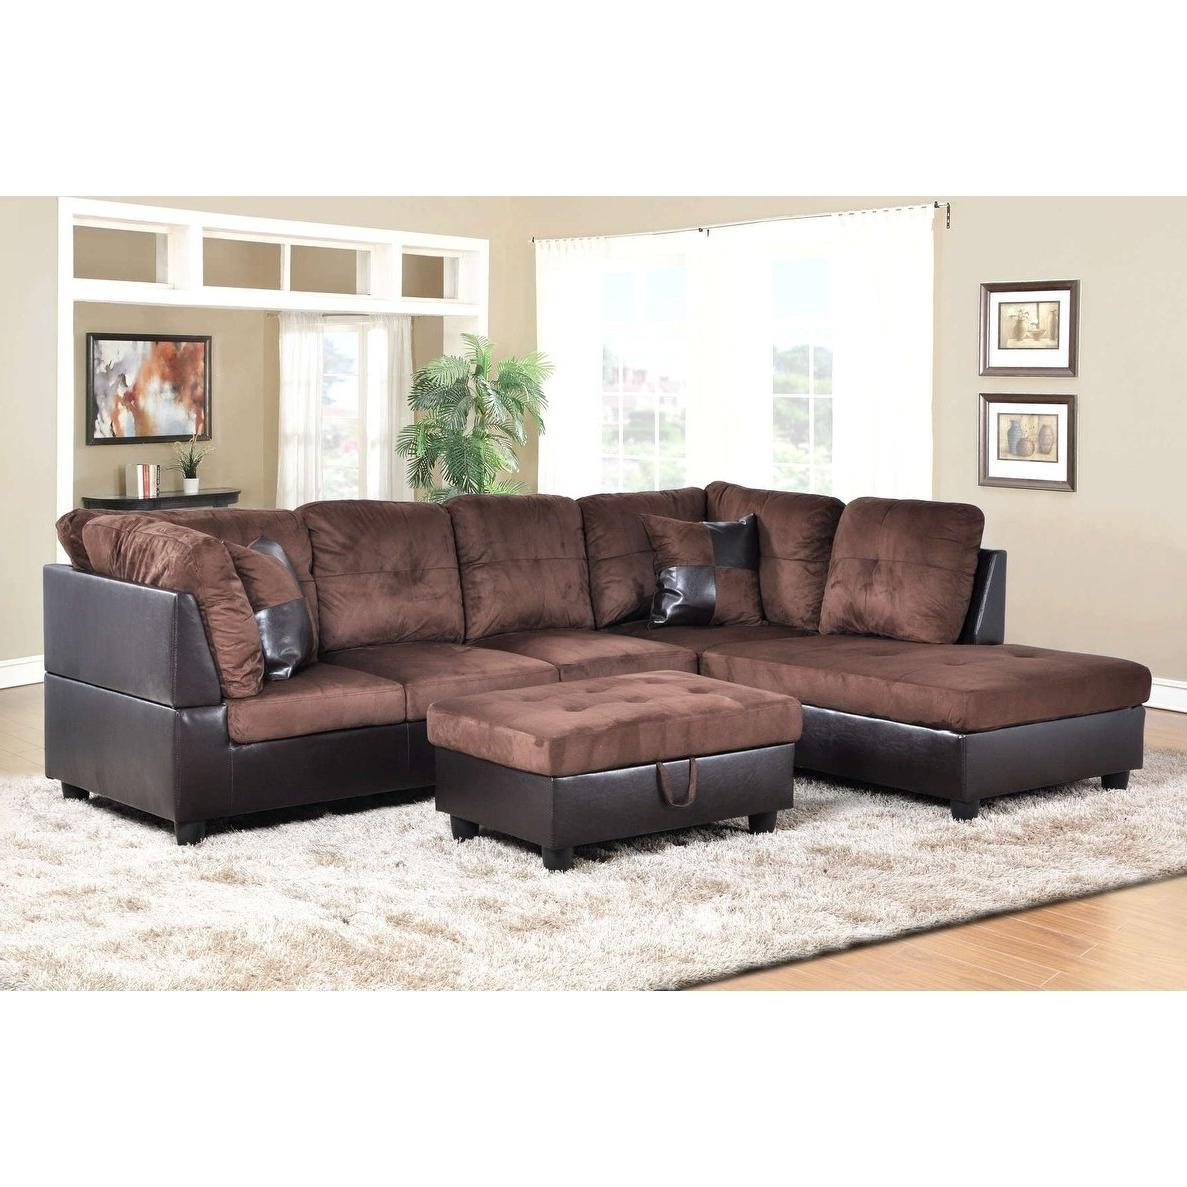 2019 Karen 3 Piece Sectionals Throughout Shop Golden Coast Furniture 3 Piece Microfiber Leather Sofa (Gallery 16 of 20)